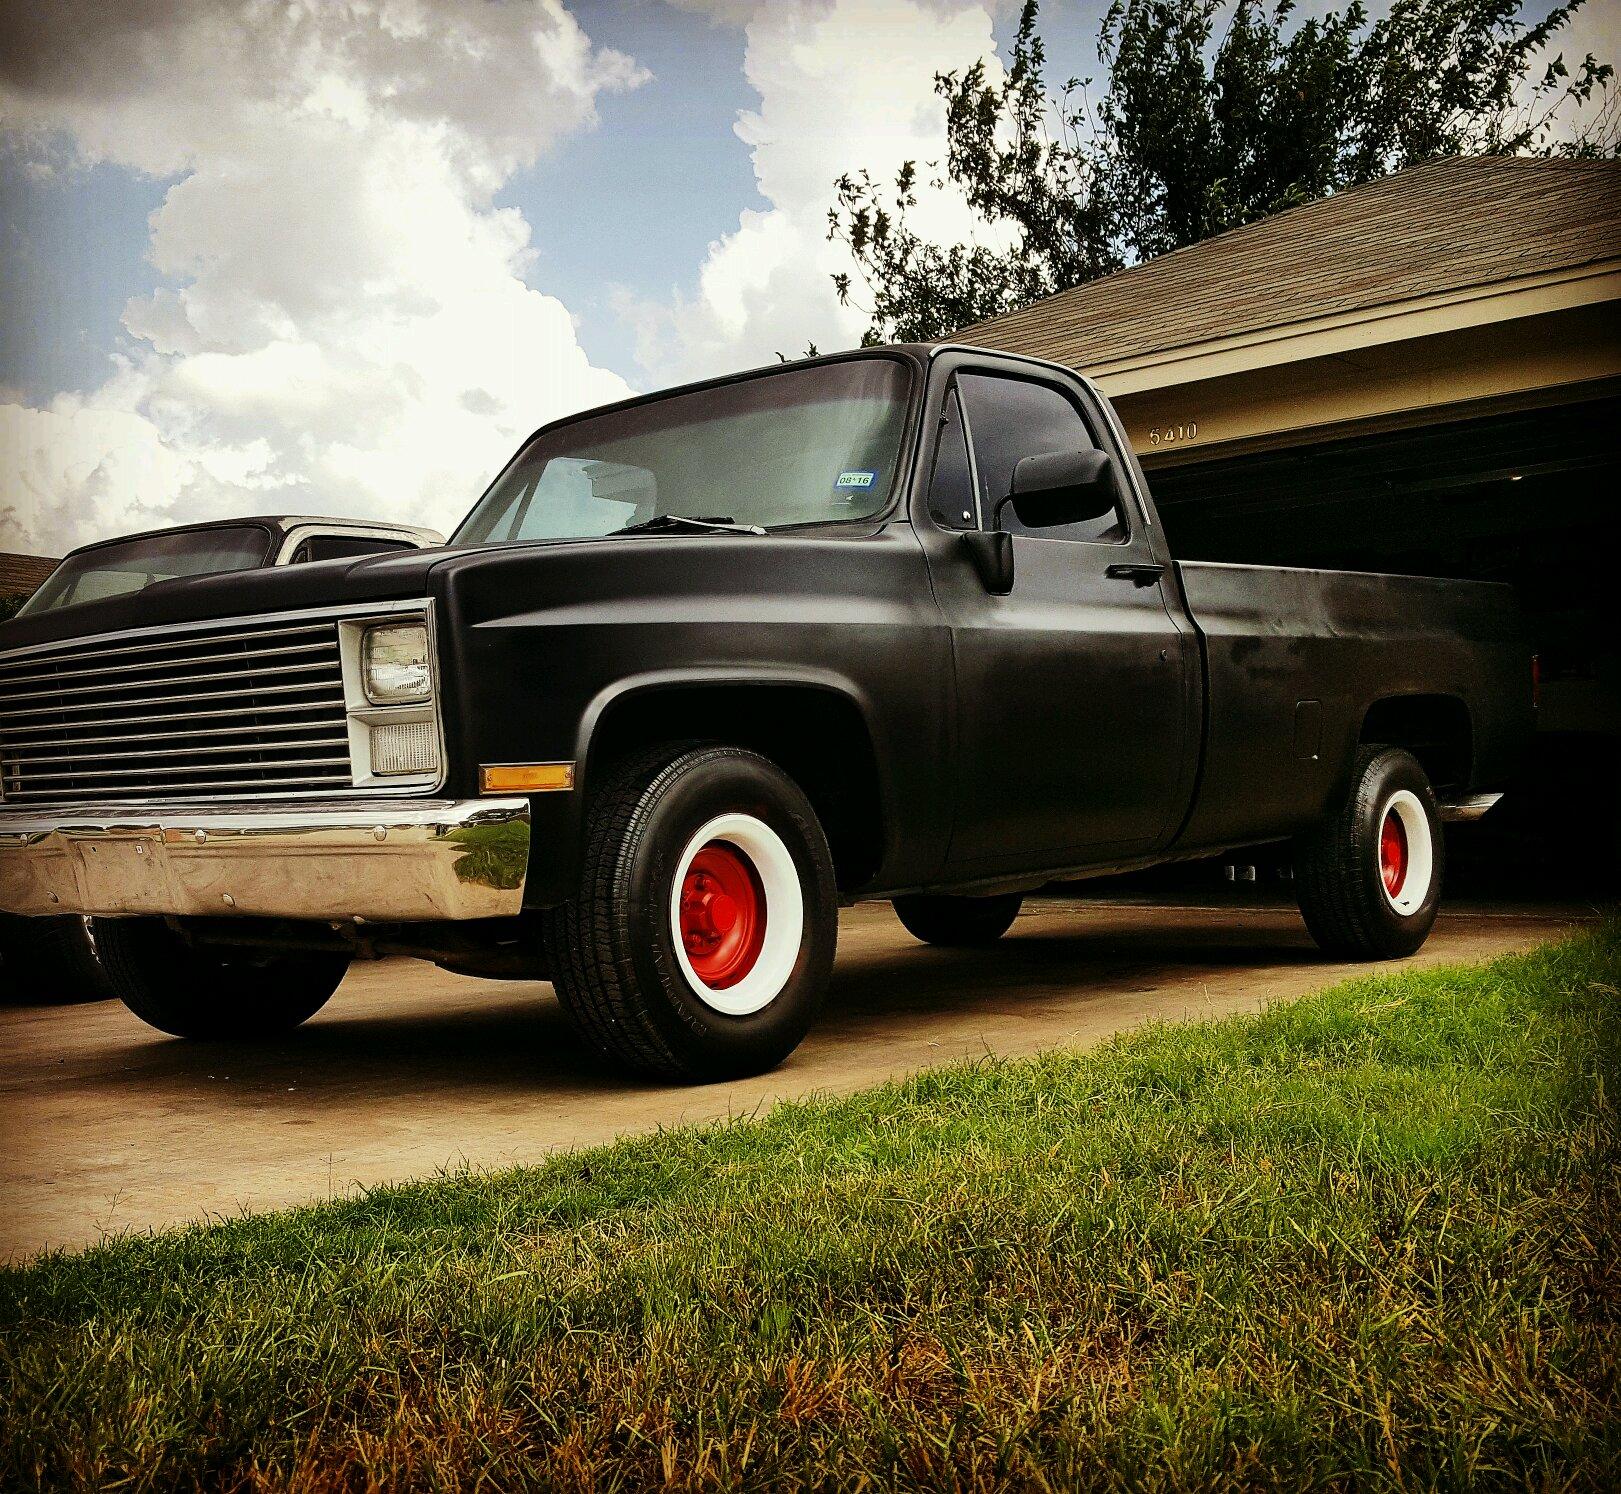 My 83 lwb shop truck project